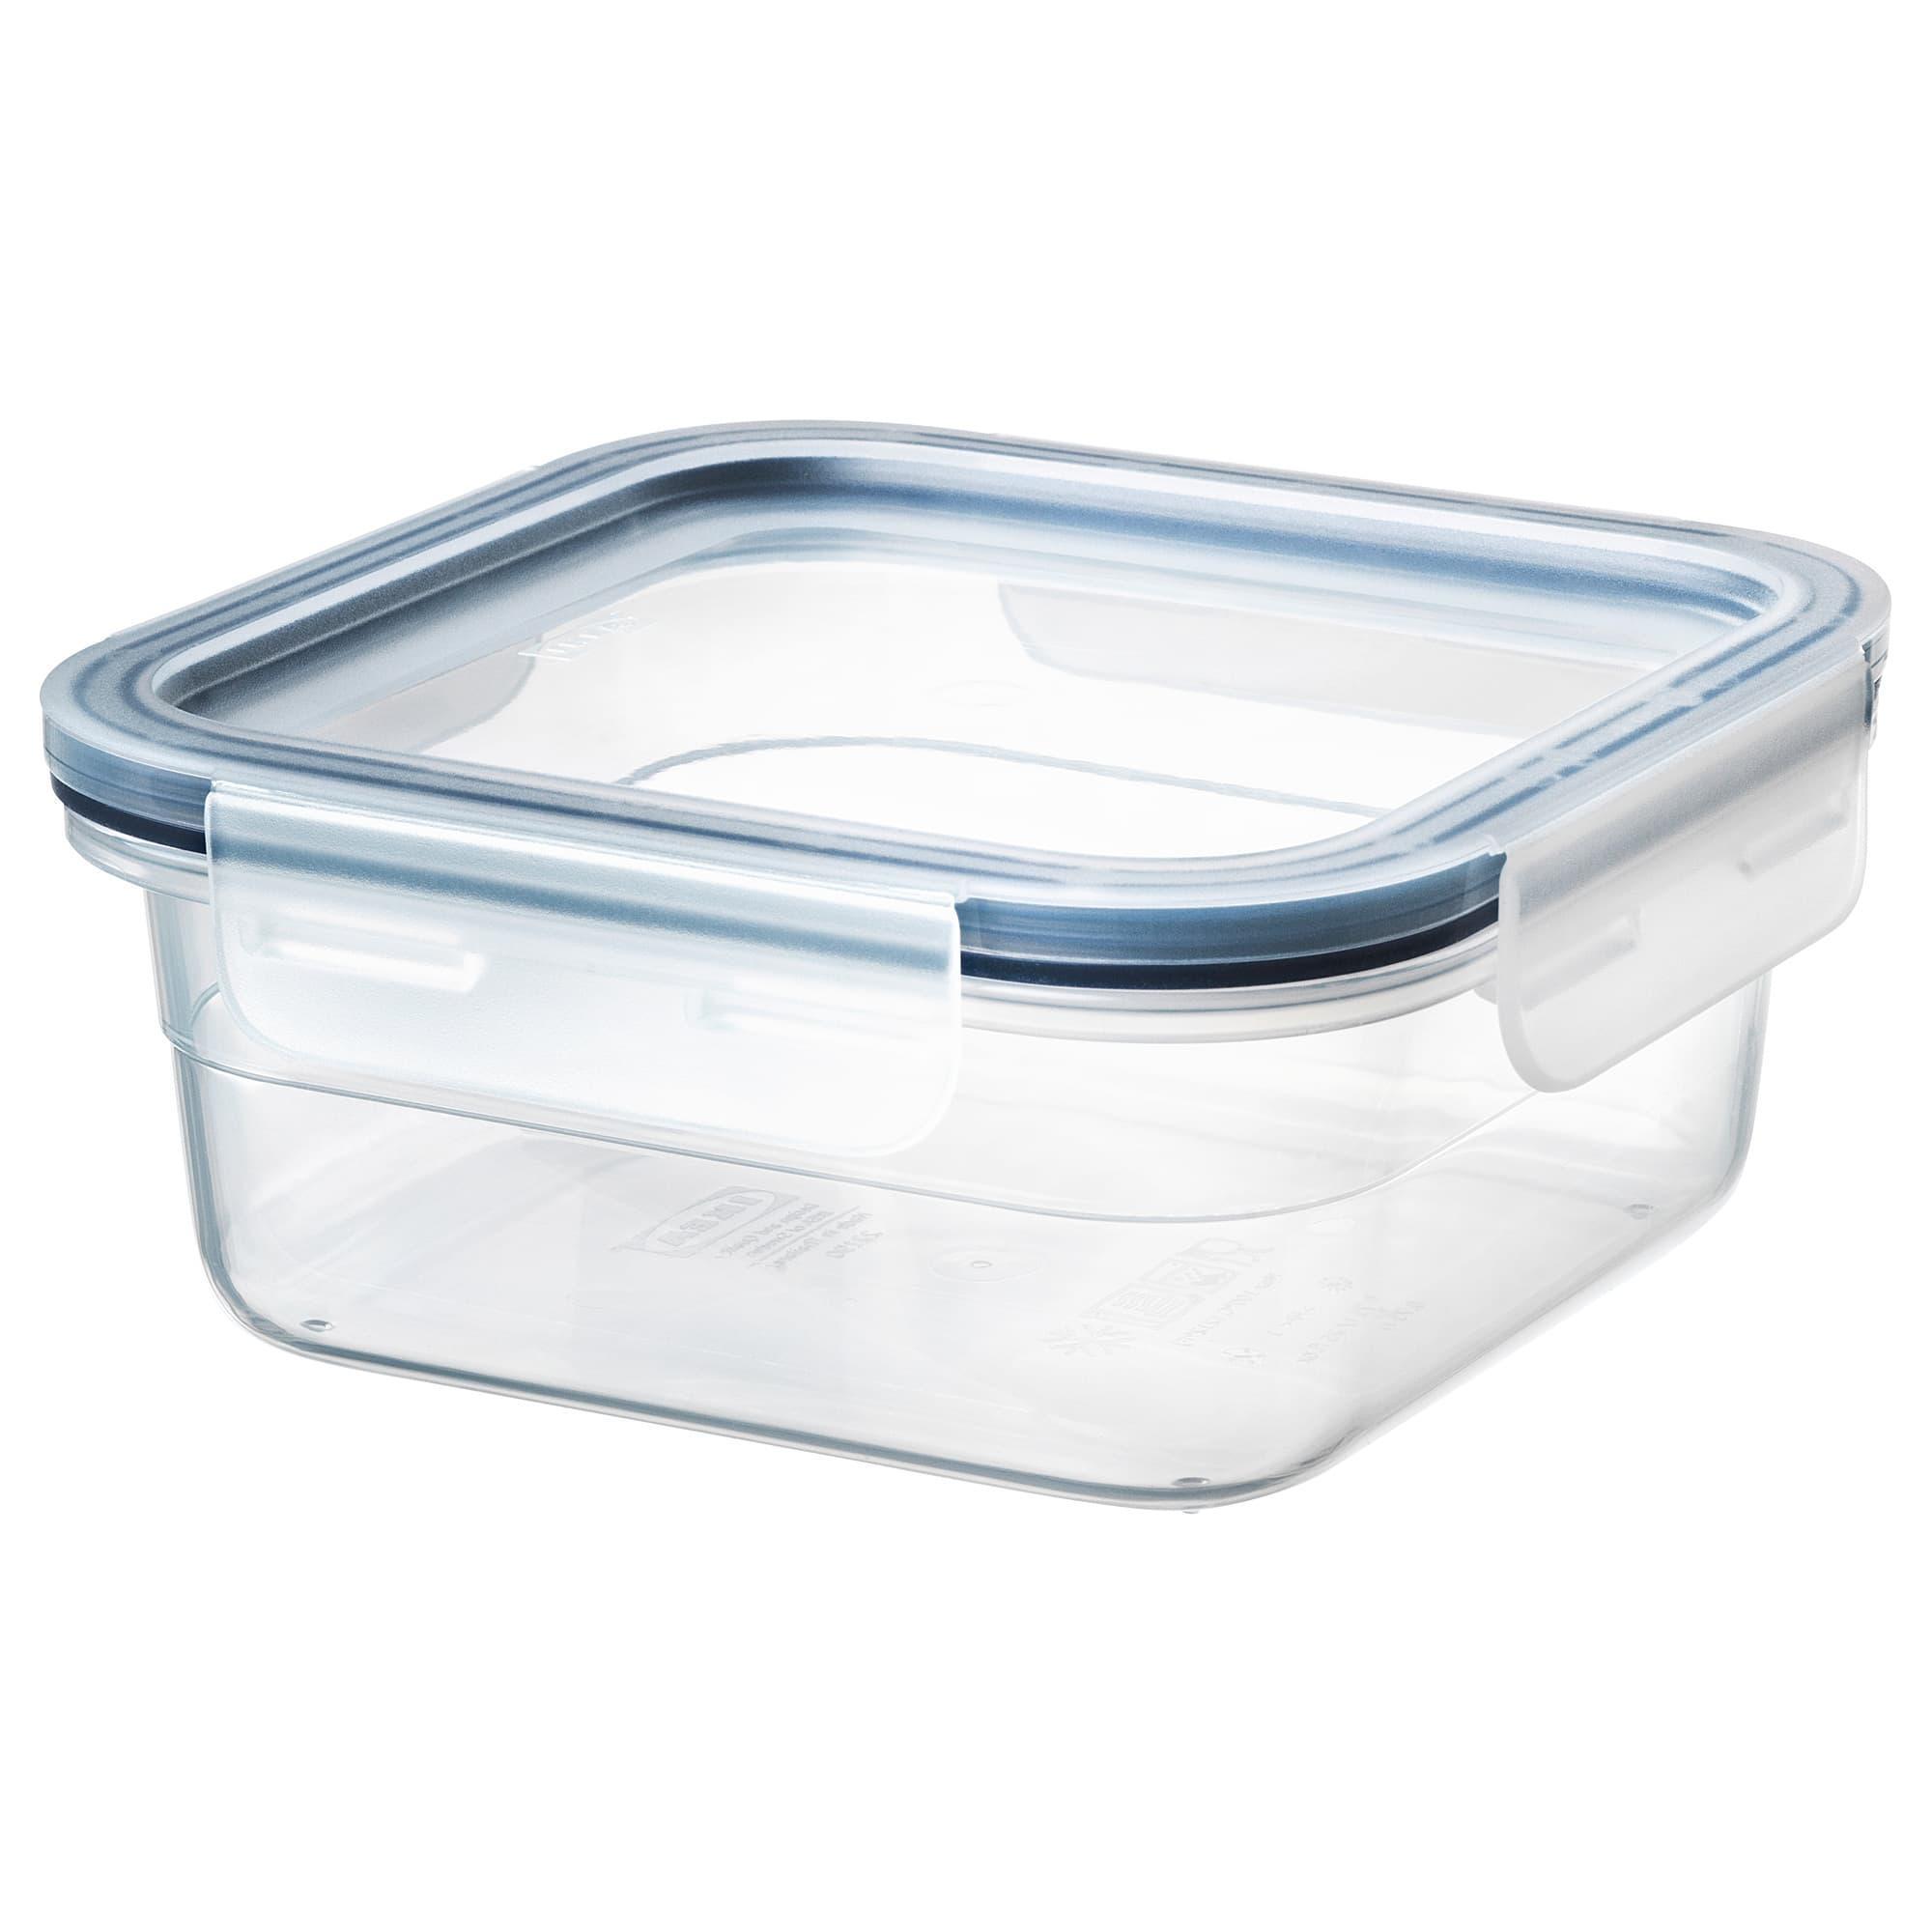 PROMO!! IKEA 365  Kotak makan dengan penutup, segi empat, plastik MURAH /  BUBBLE 3 LAPIS / ORIGINAL / IKEA ORIGINAL